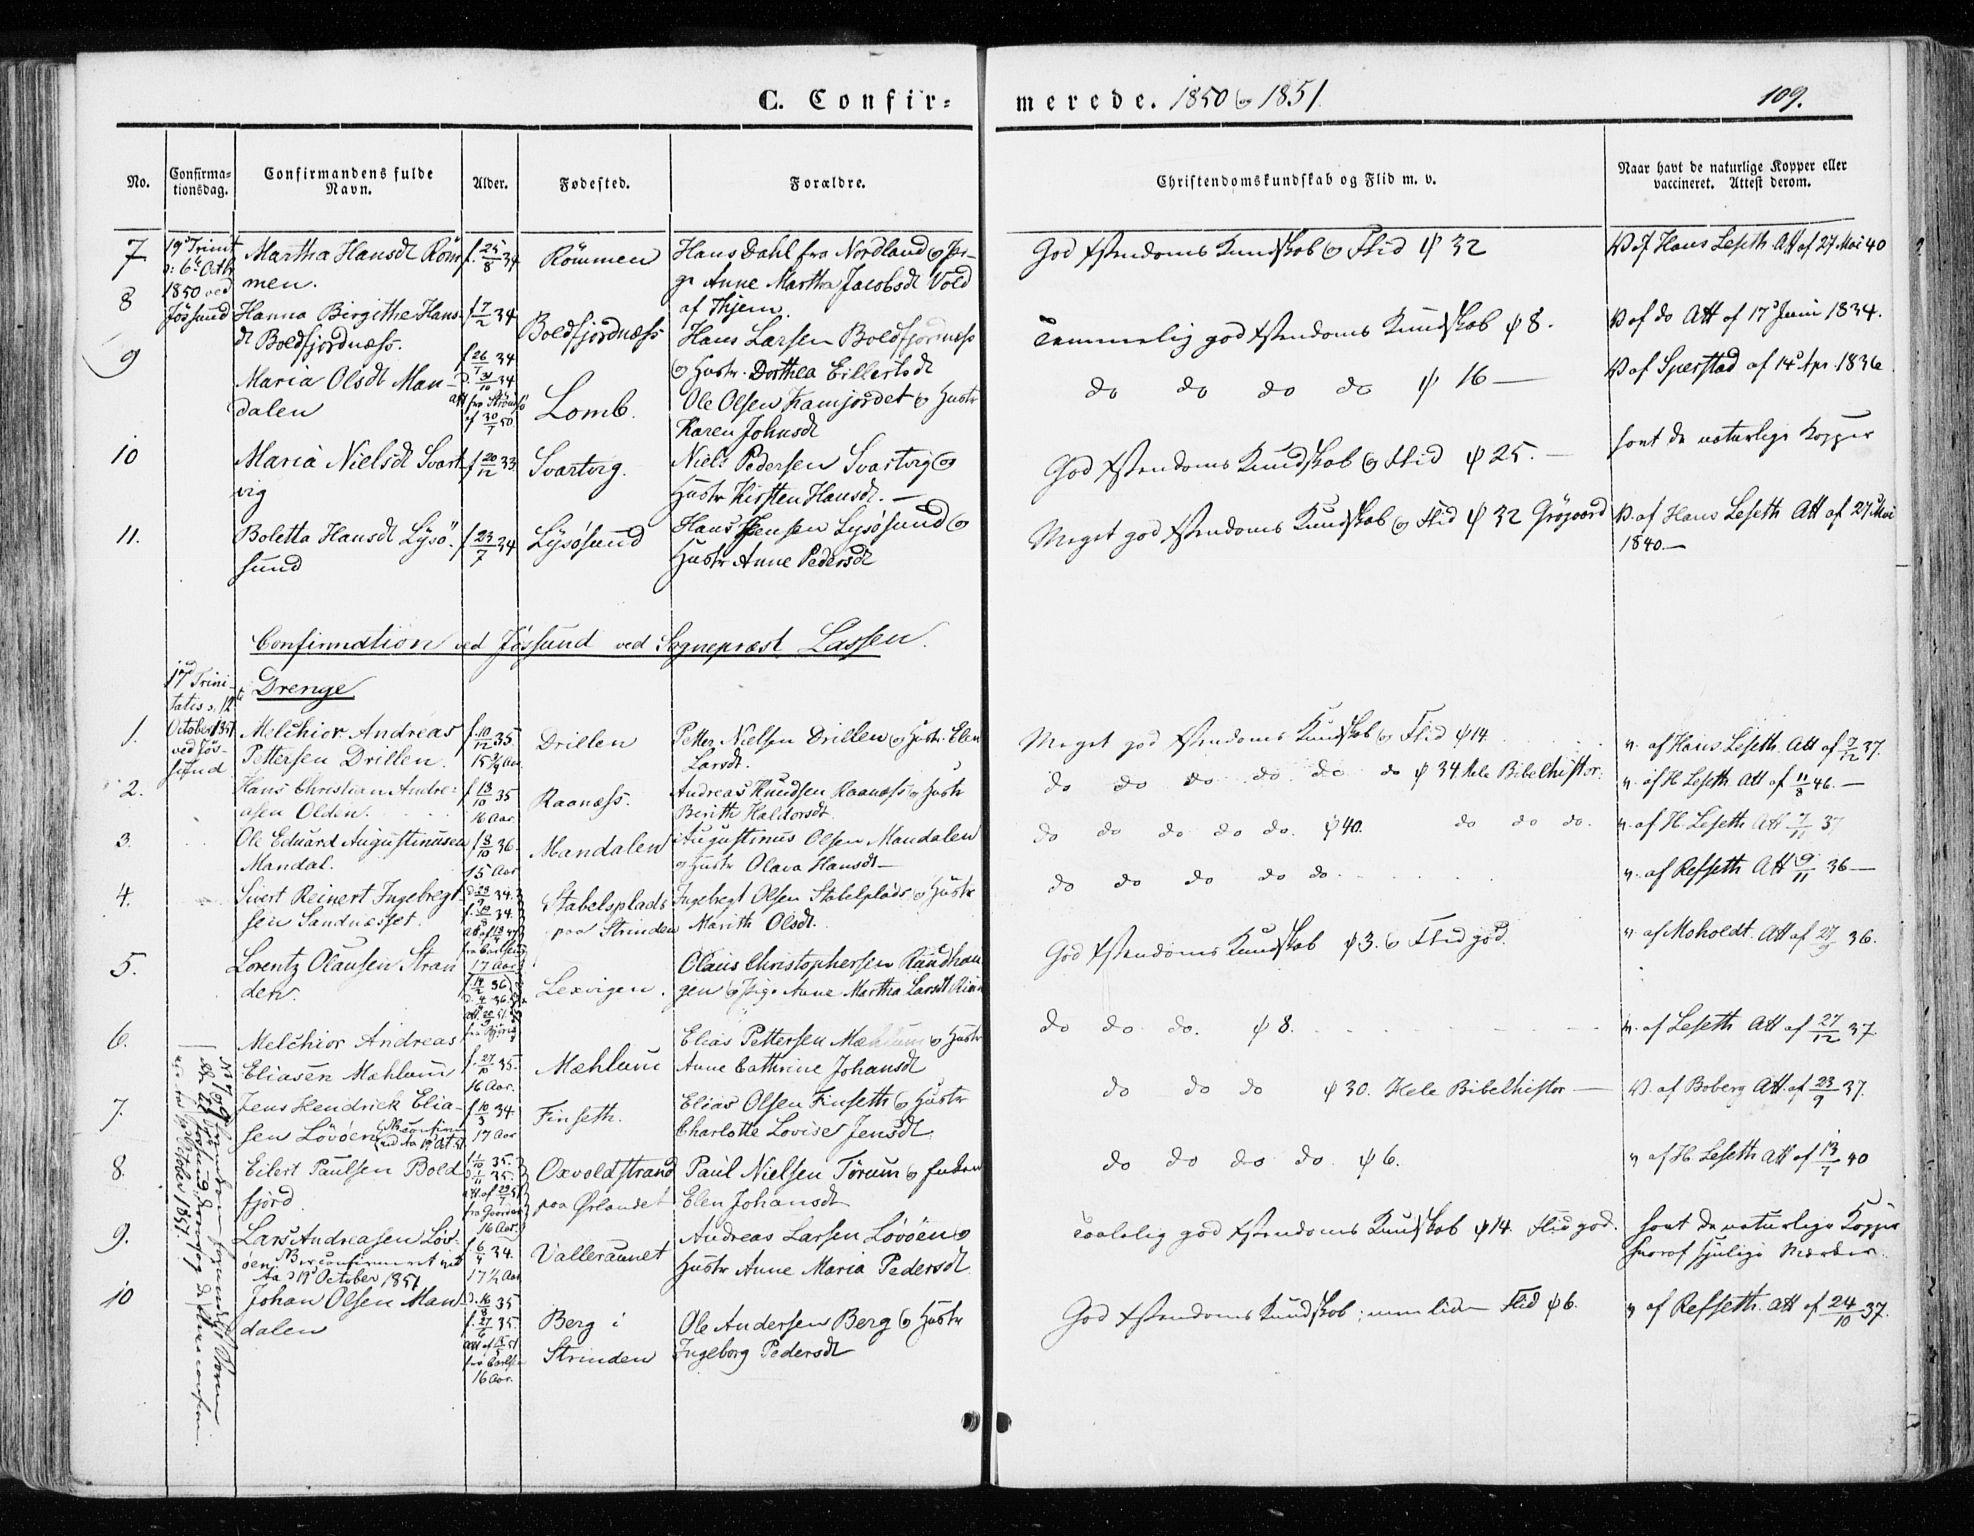 SAT, Ministerialprotokoller, klokkerbøker og fødselsregistre - Sør-Trøndelag, 655/L0677: Parish register (official) no. 655A06, 1847-1860, p. 109